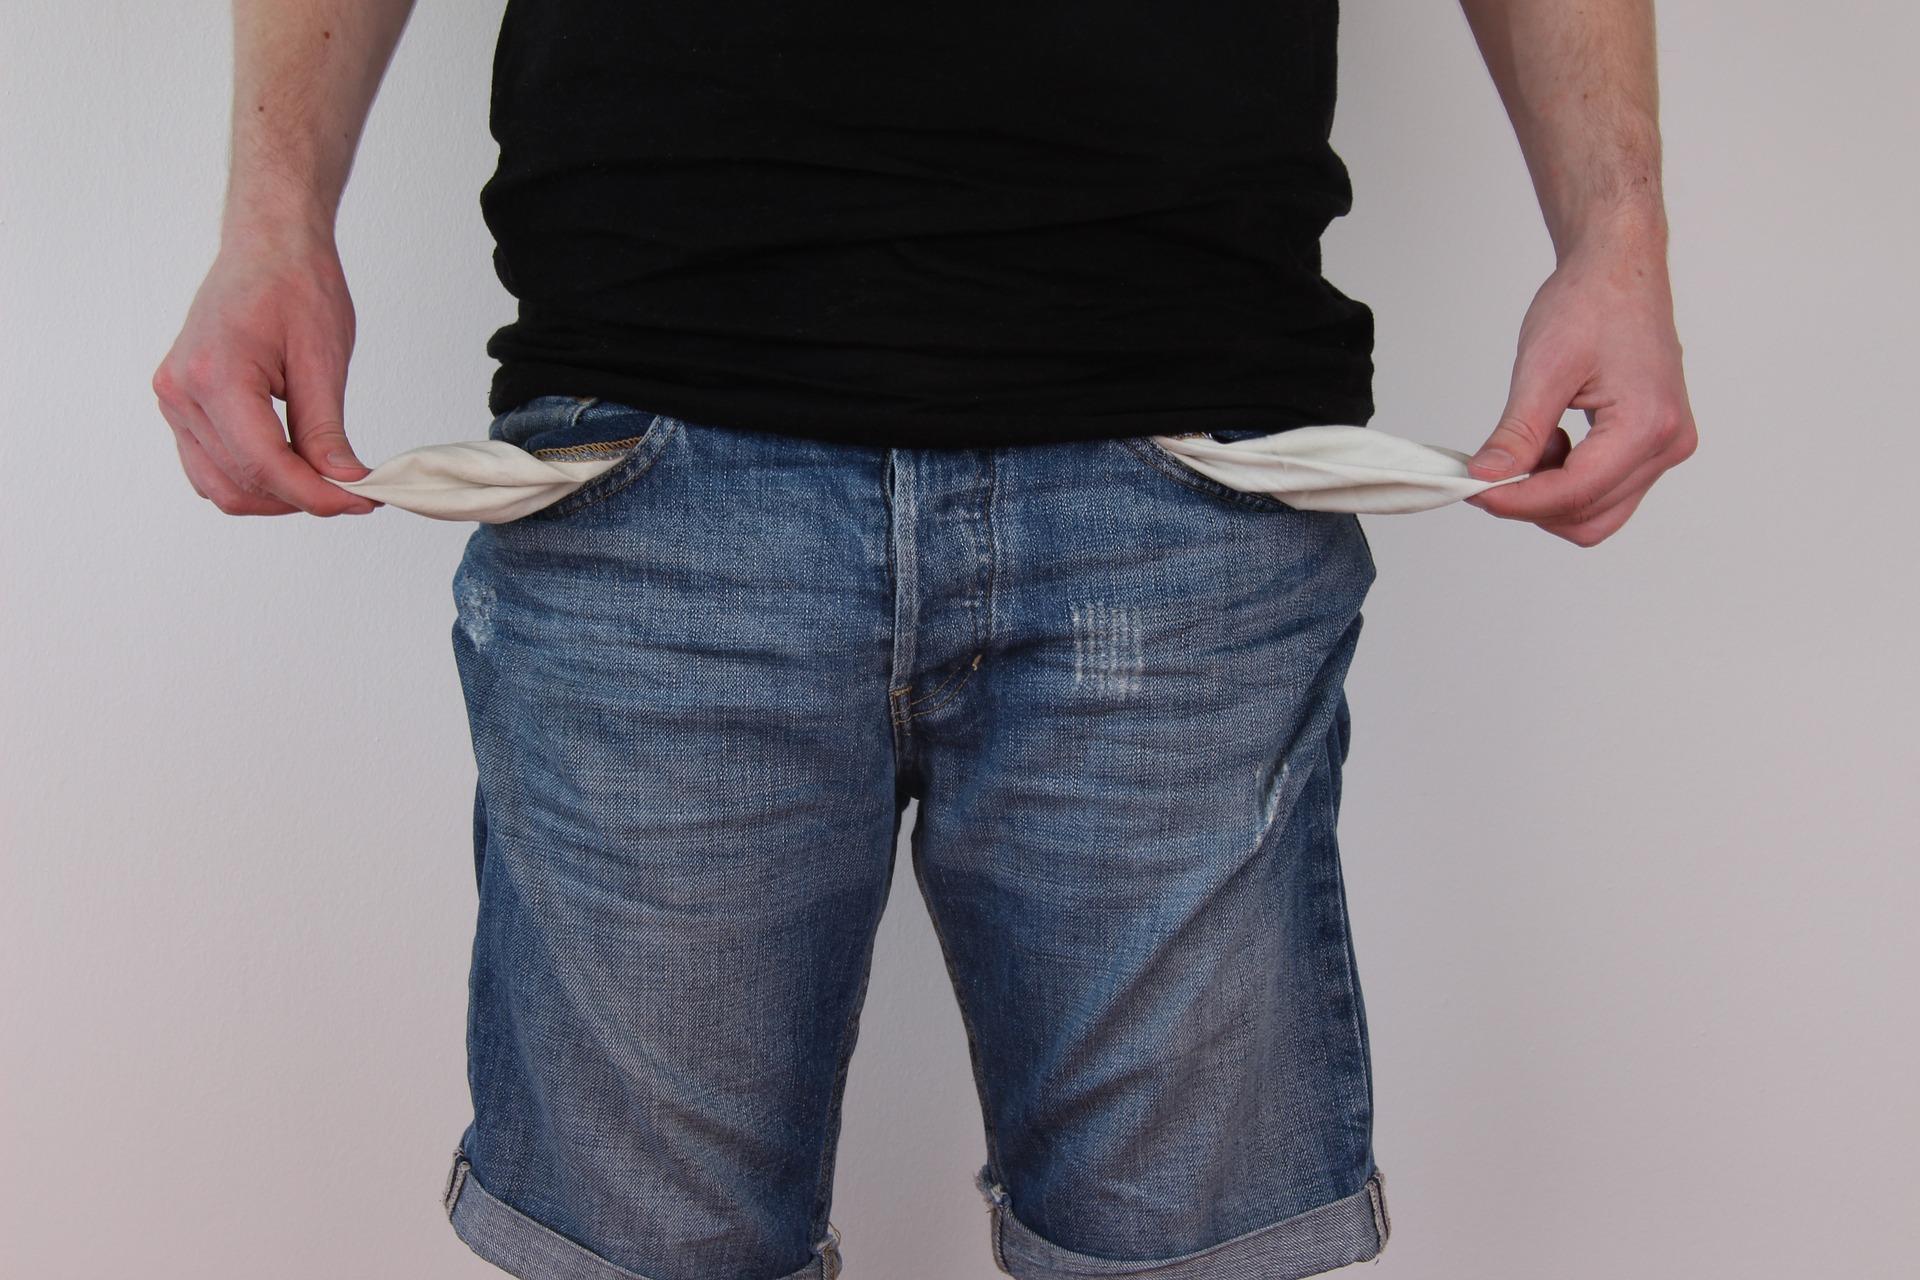 Bankrupt Family Law